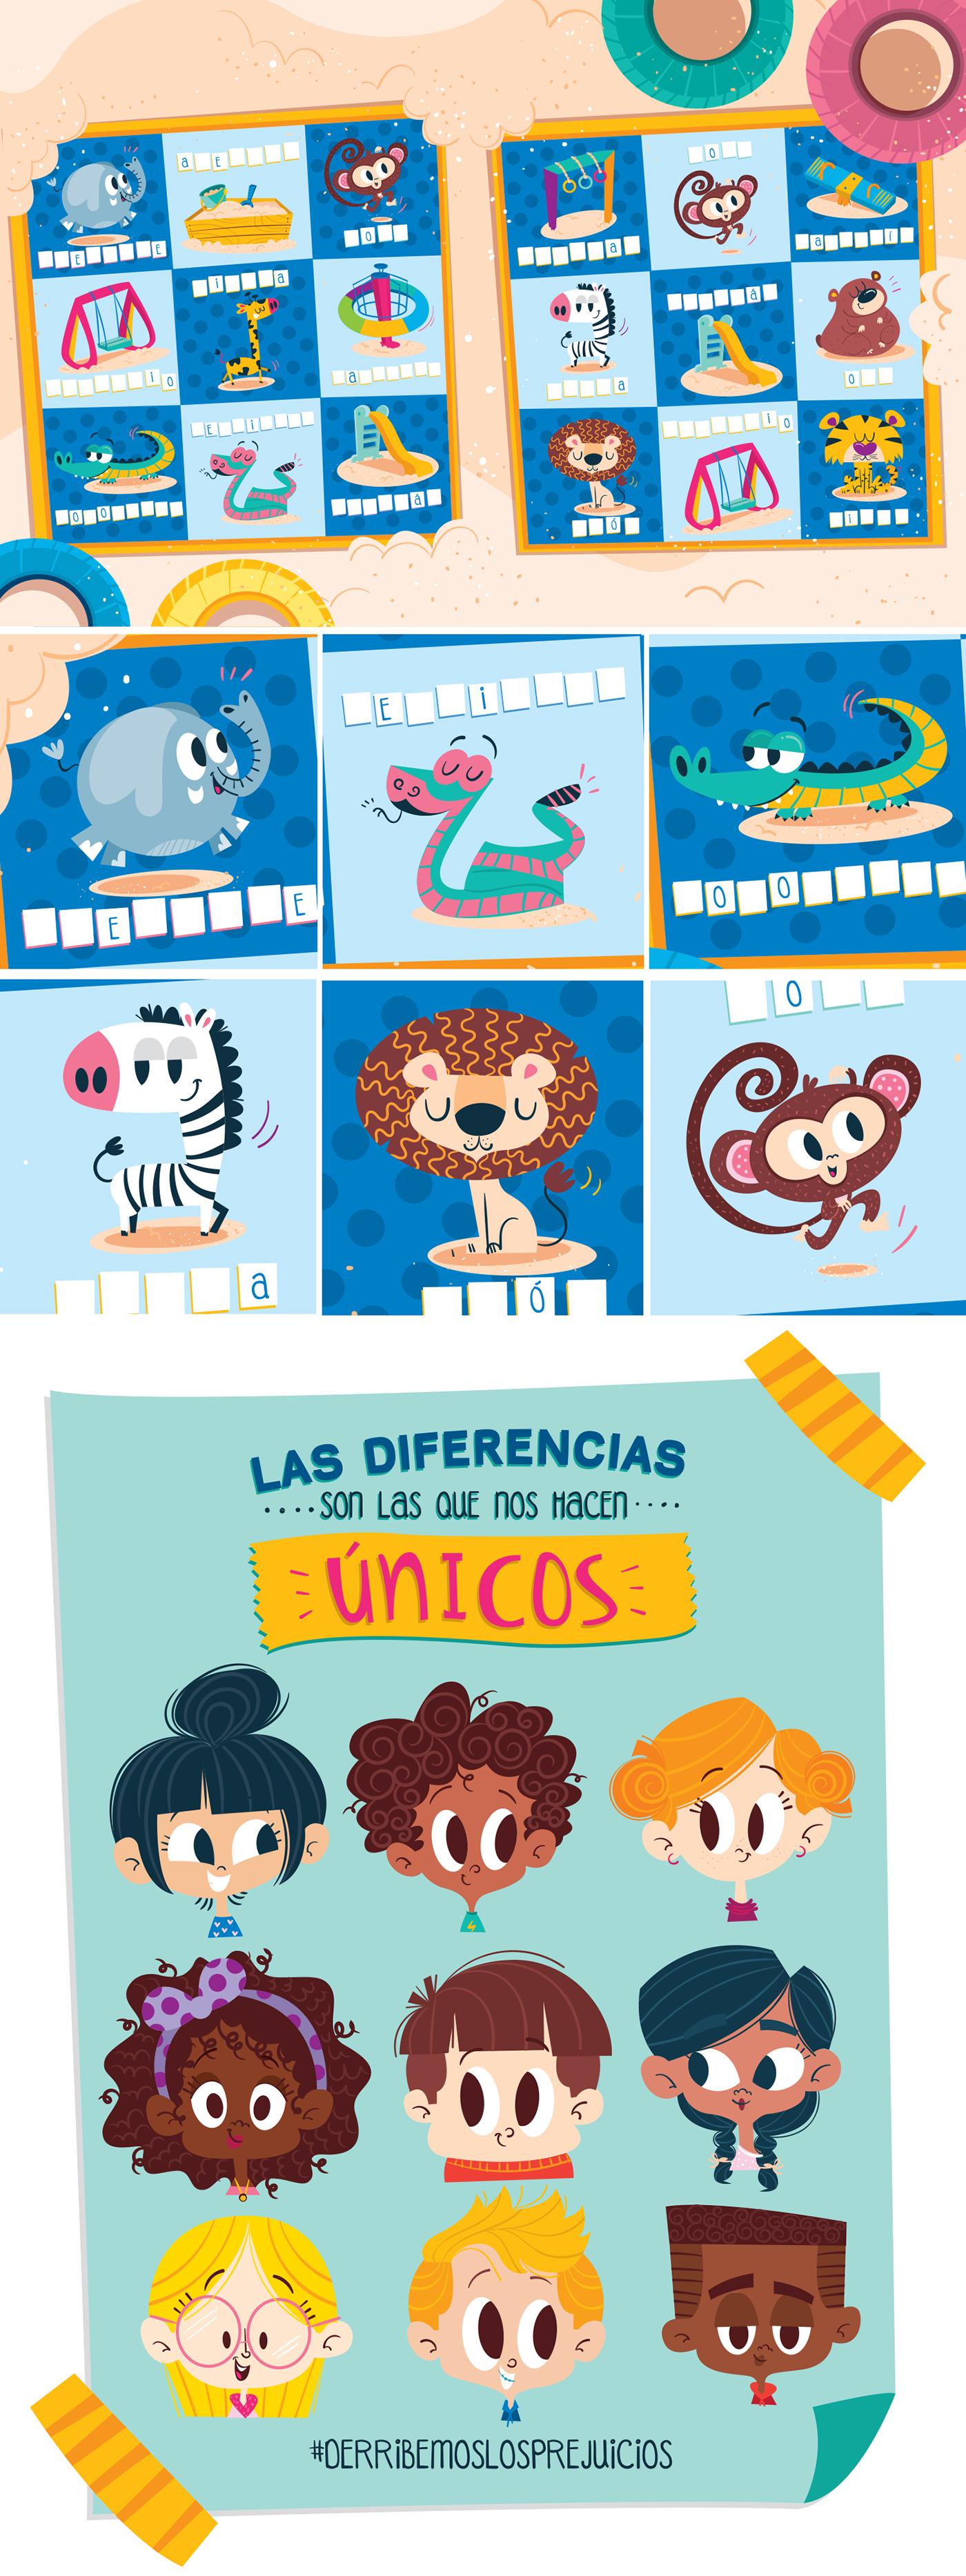 livro didático educational books Cildren's book cute Fun vector livro infantil vetor workbooks textbooks